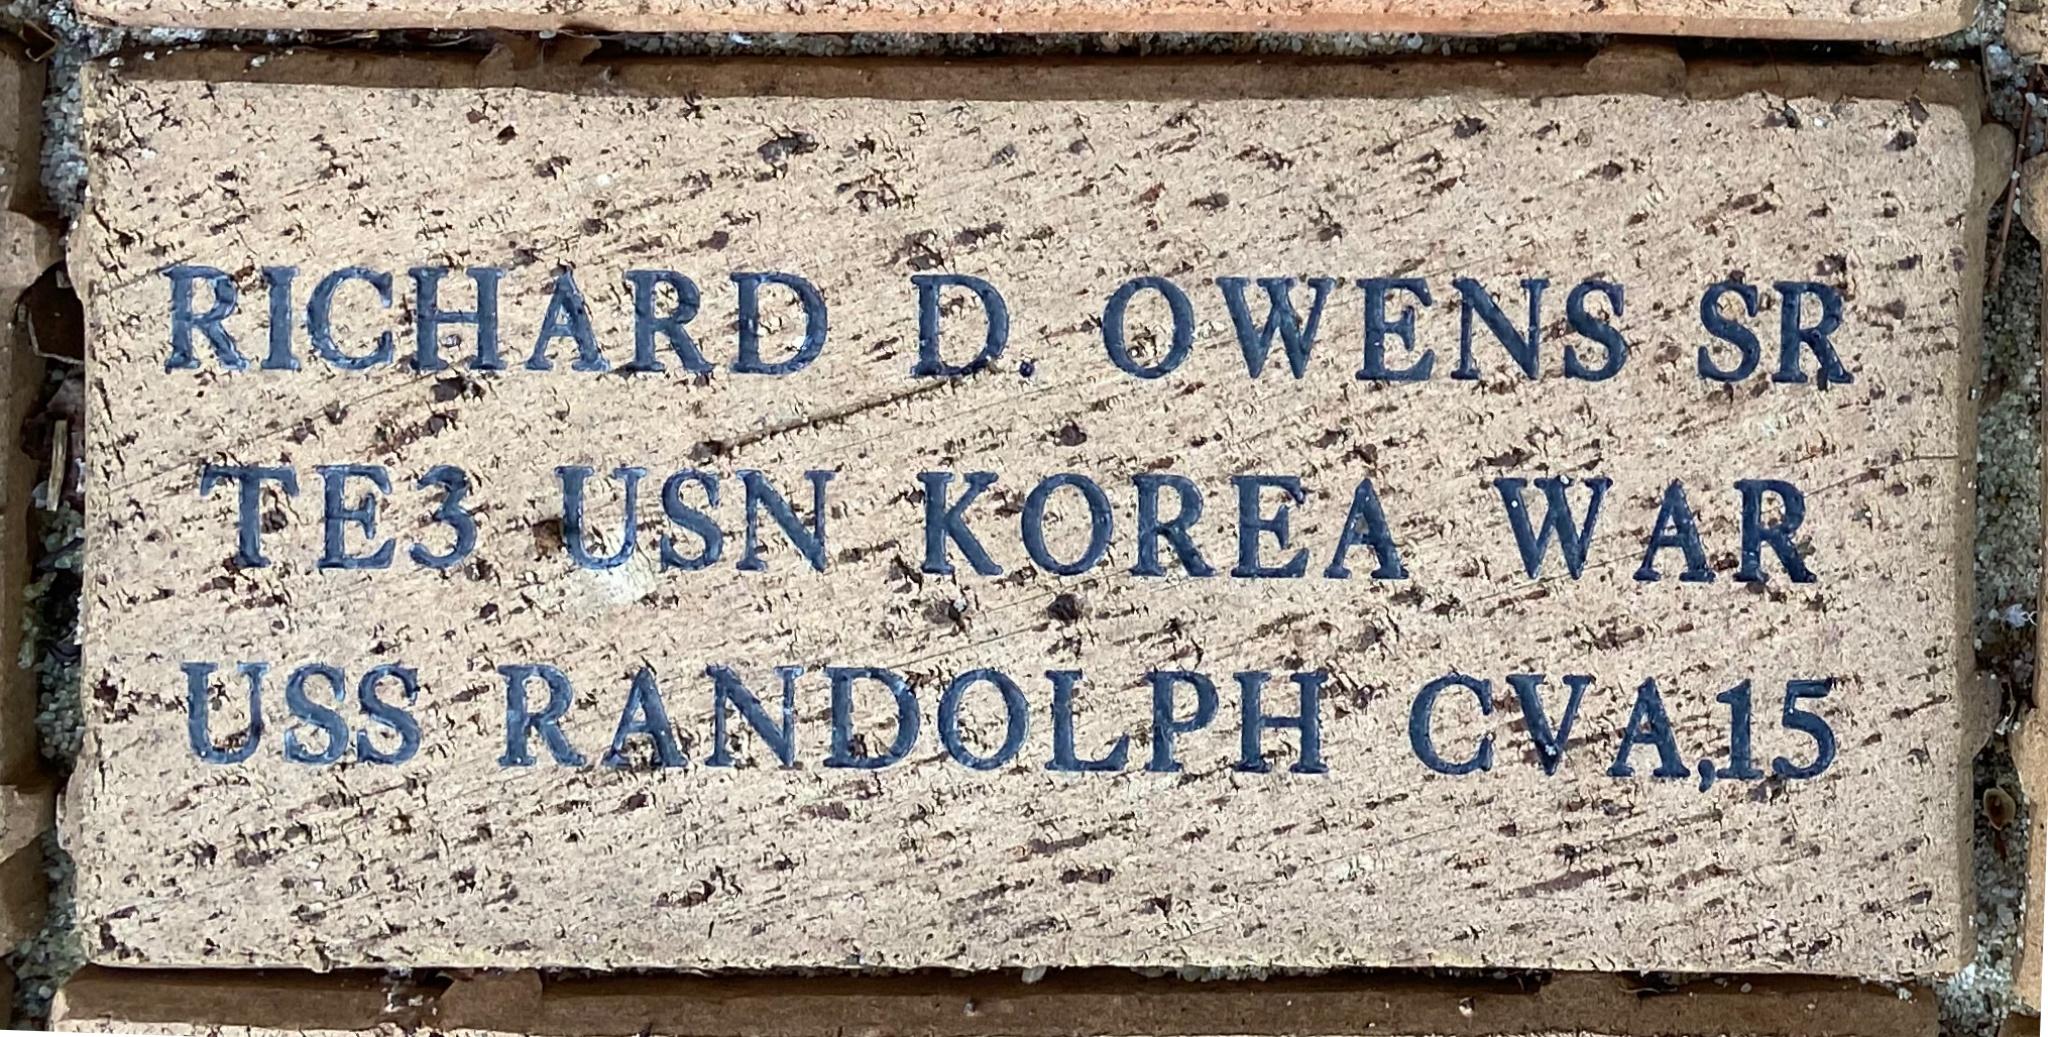 RICHARD D. OWENS SR TE3 USN KOREAN WAR USS RANDOLPH CVA15